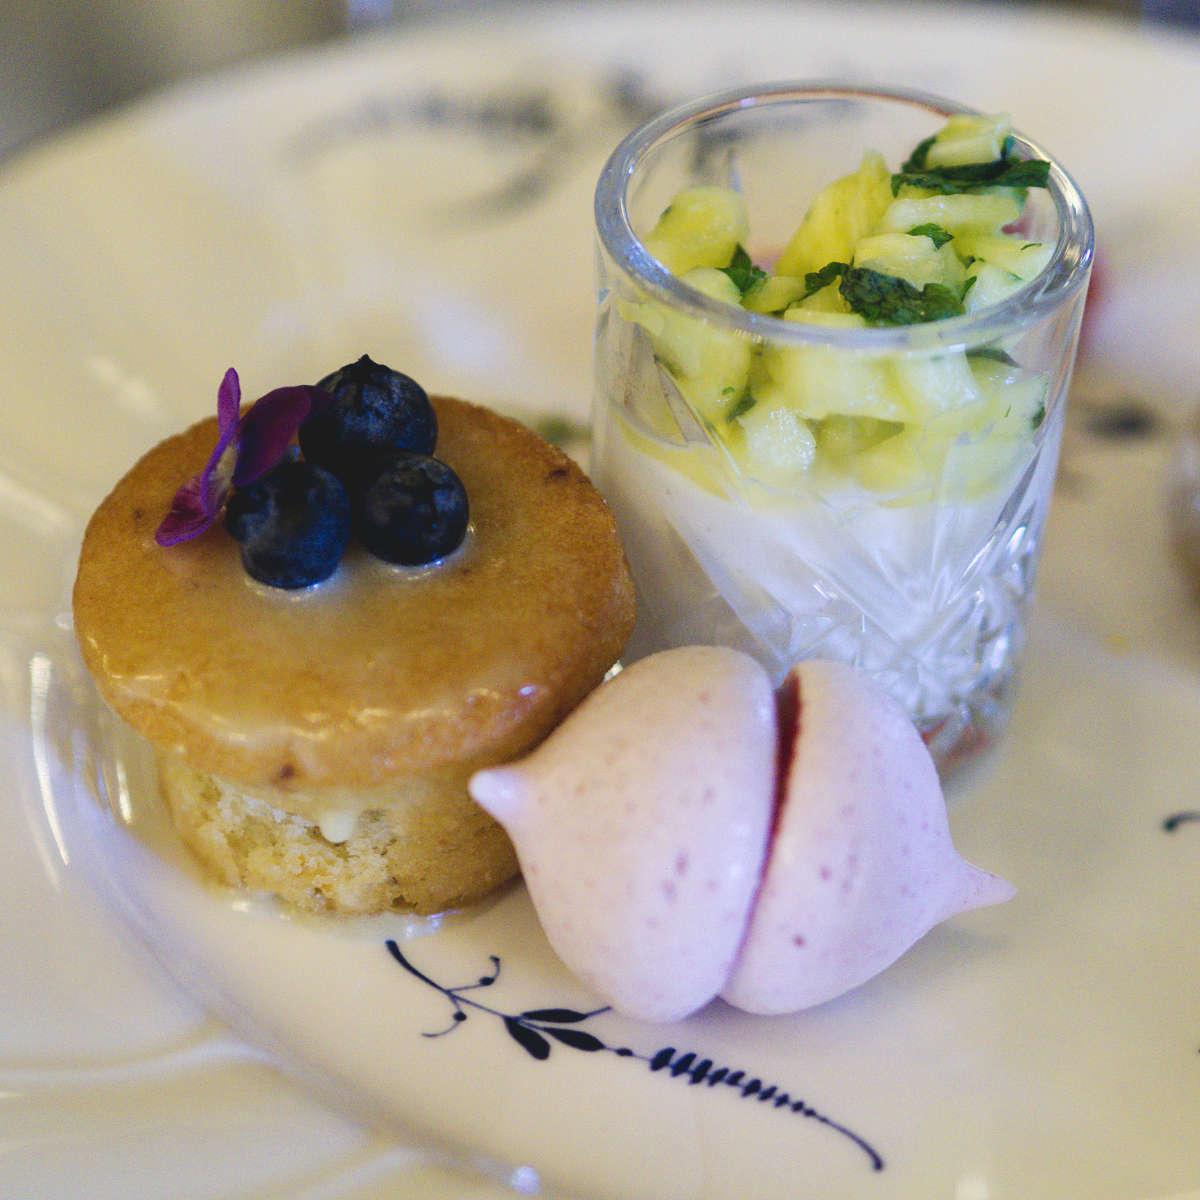 Vegan sweet treats at The Grand Cafe, Edinburgh